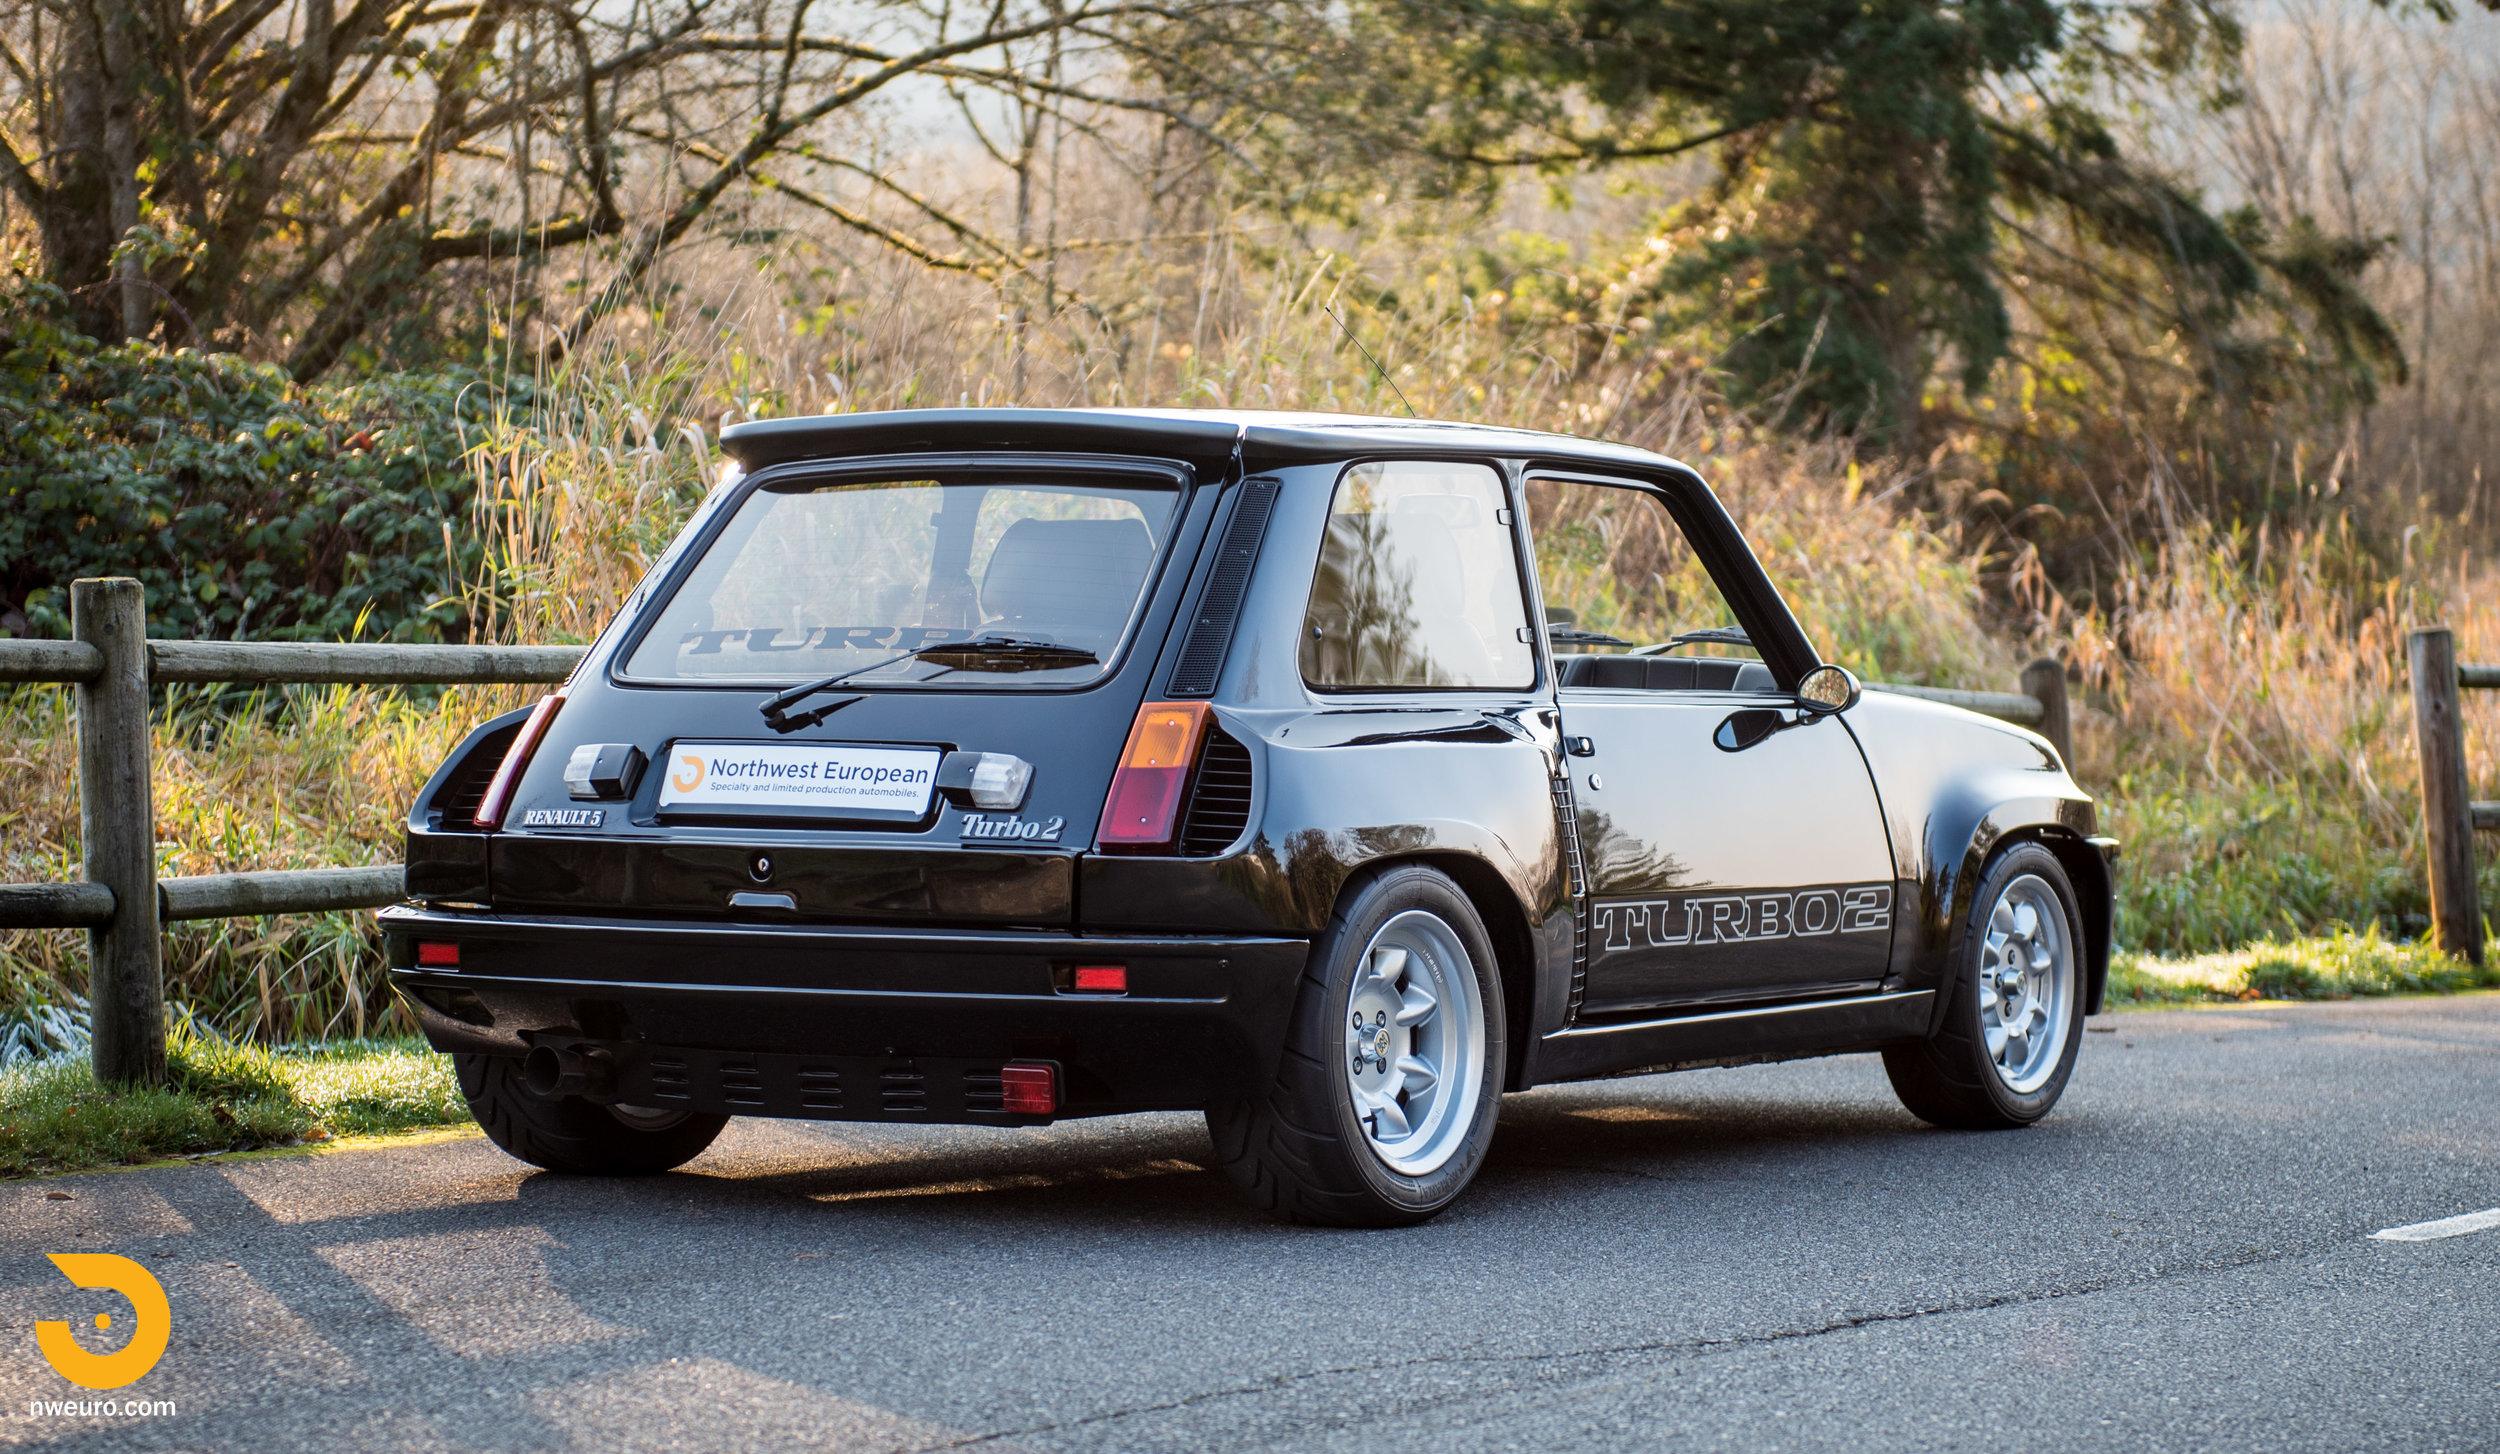 1983 Renault R5 Turbo 2 Black at Park-1.jpg